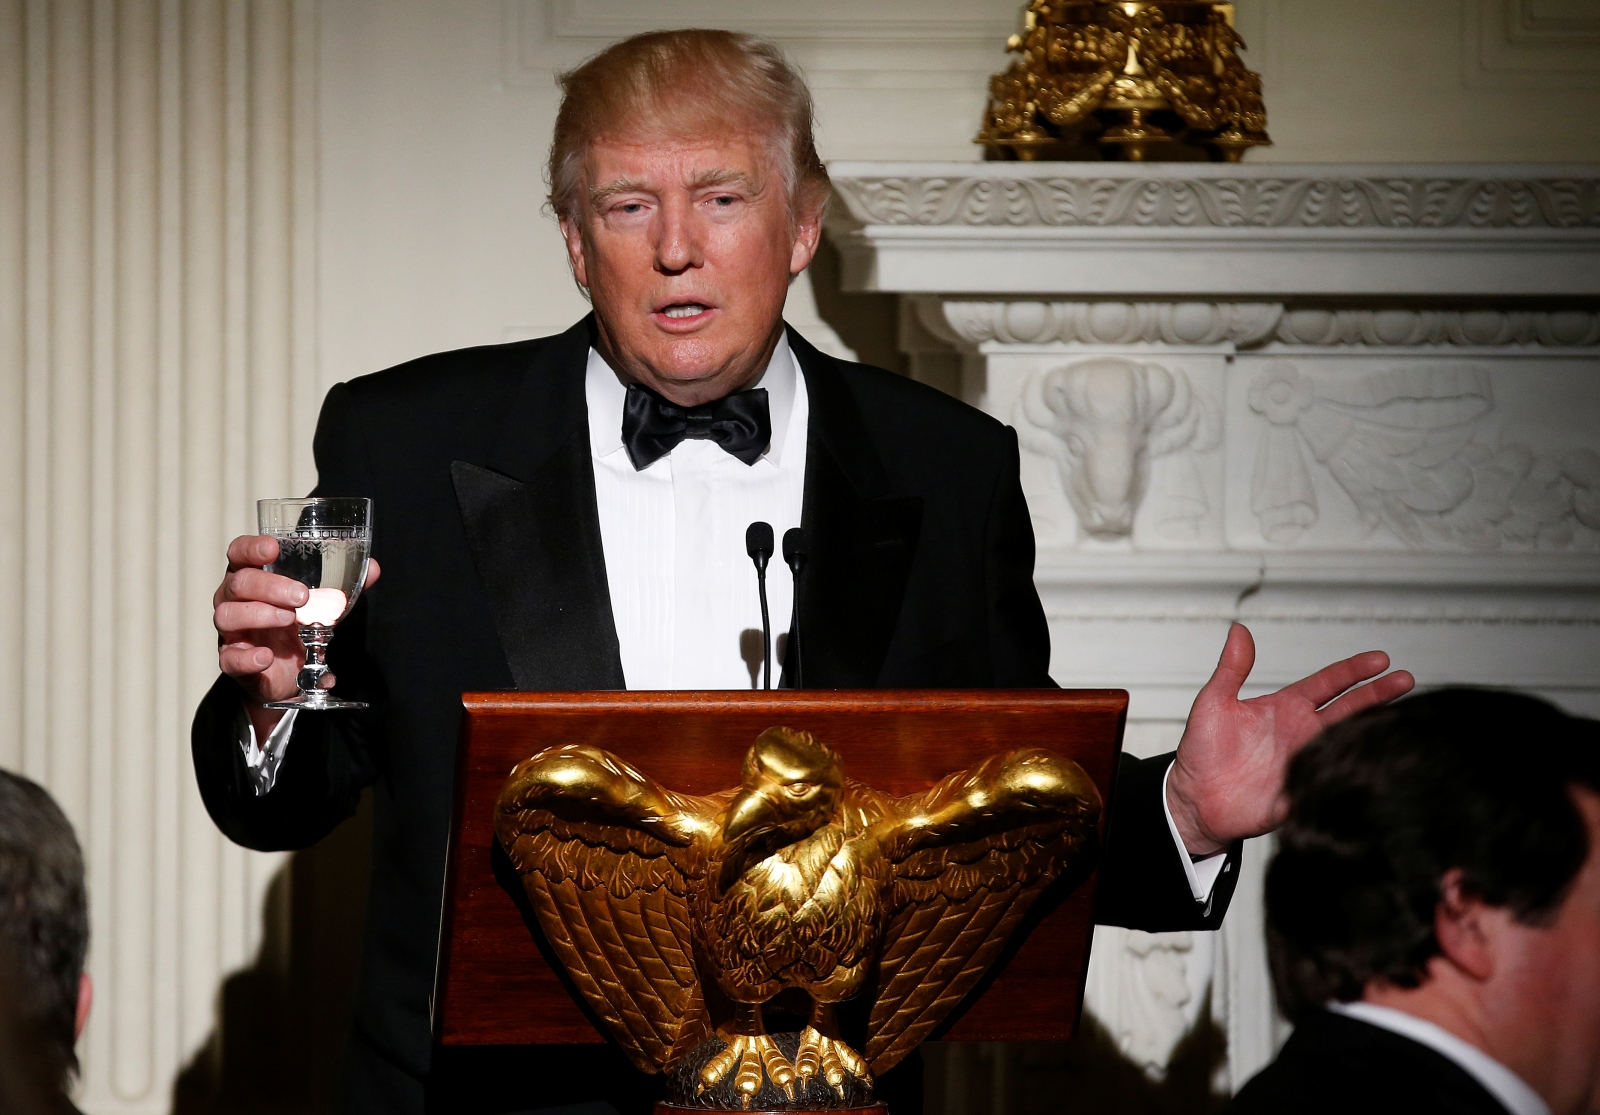 USA-TRUMP/GOVERNORS